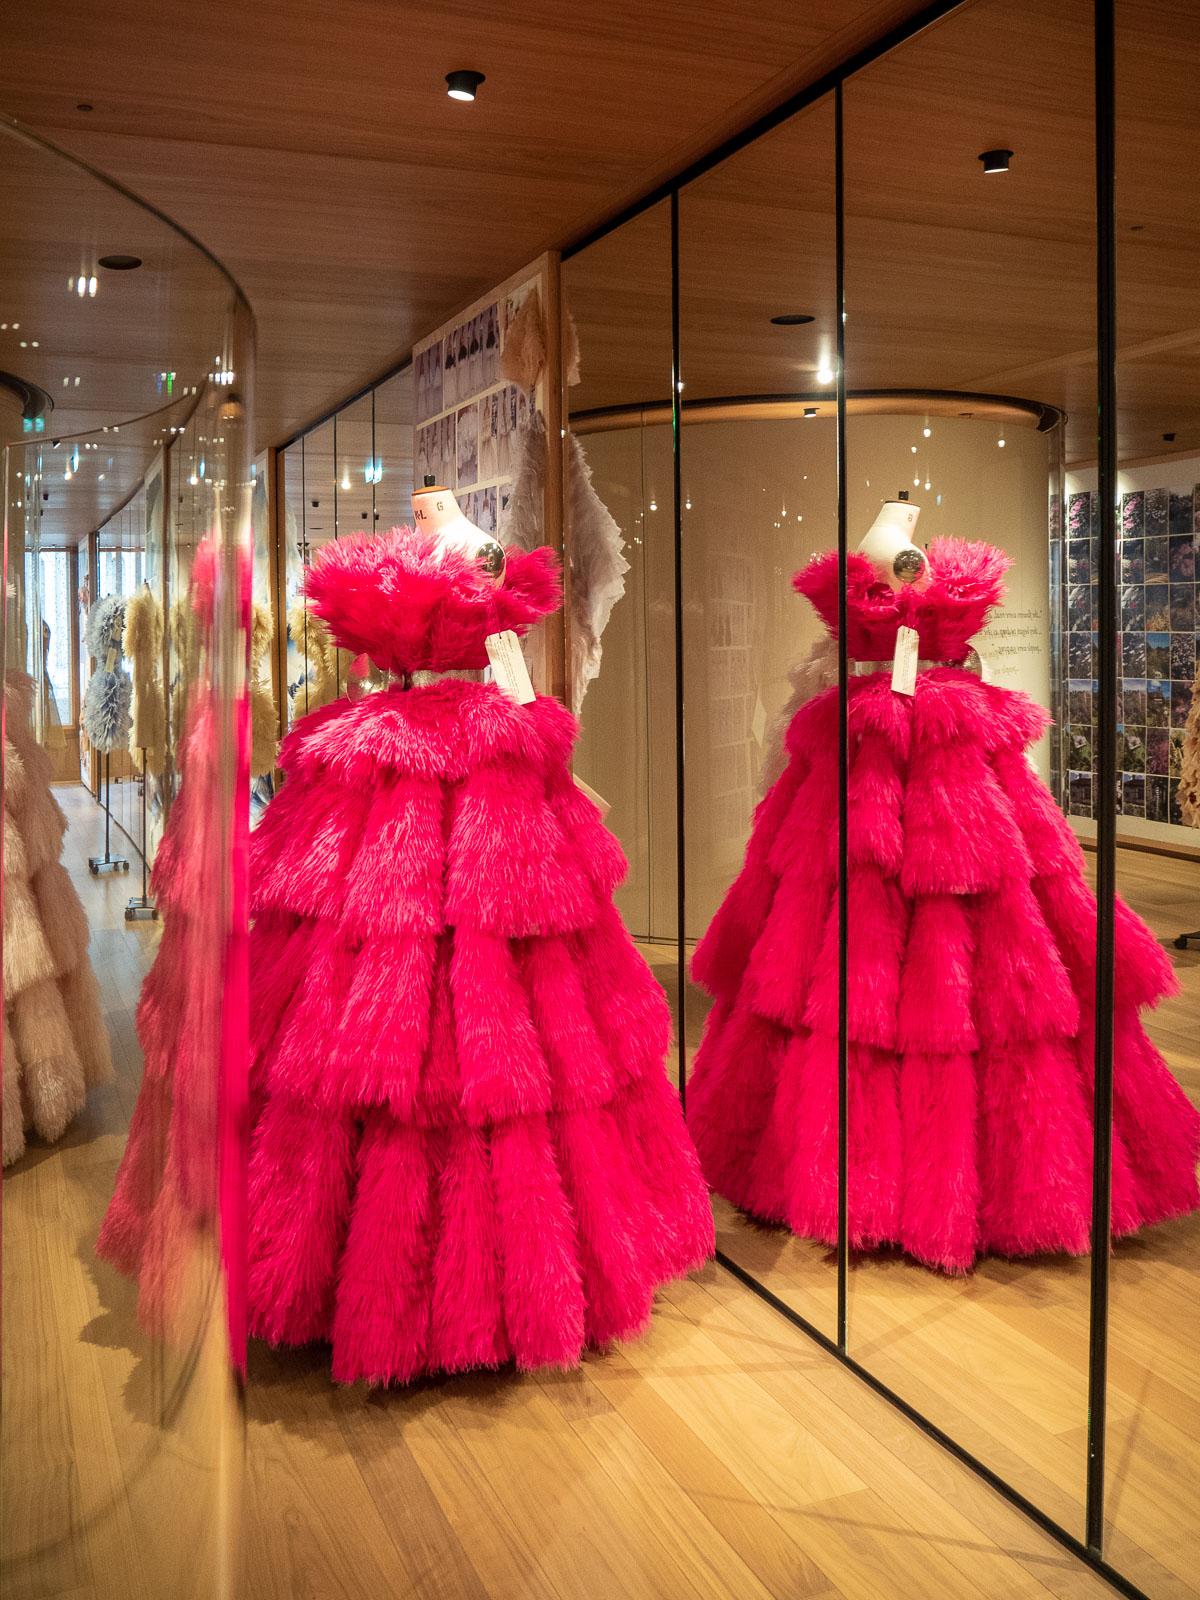 Alexander McQueen, fashion exhibition, haute couture, couture, fashion, clothing, designer clothing